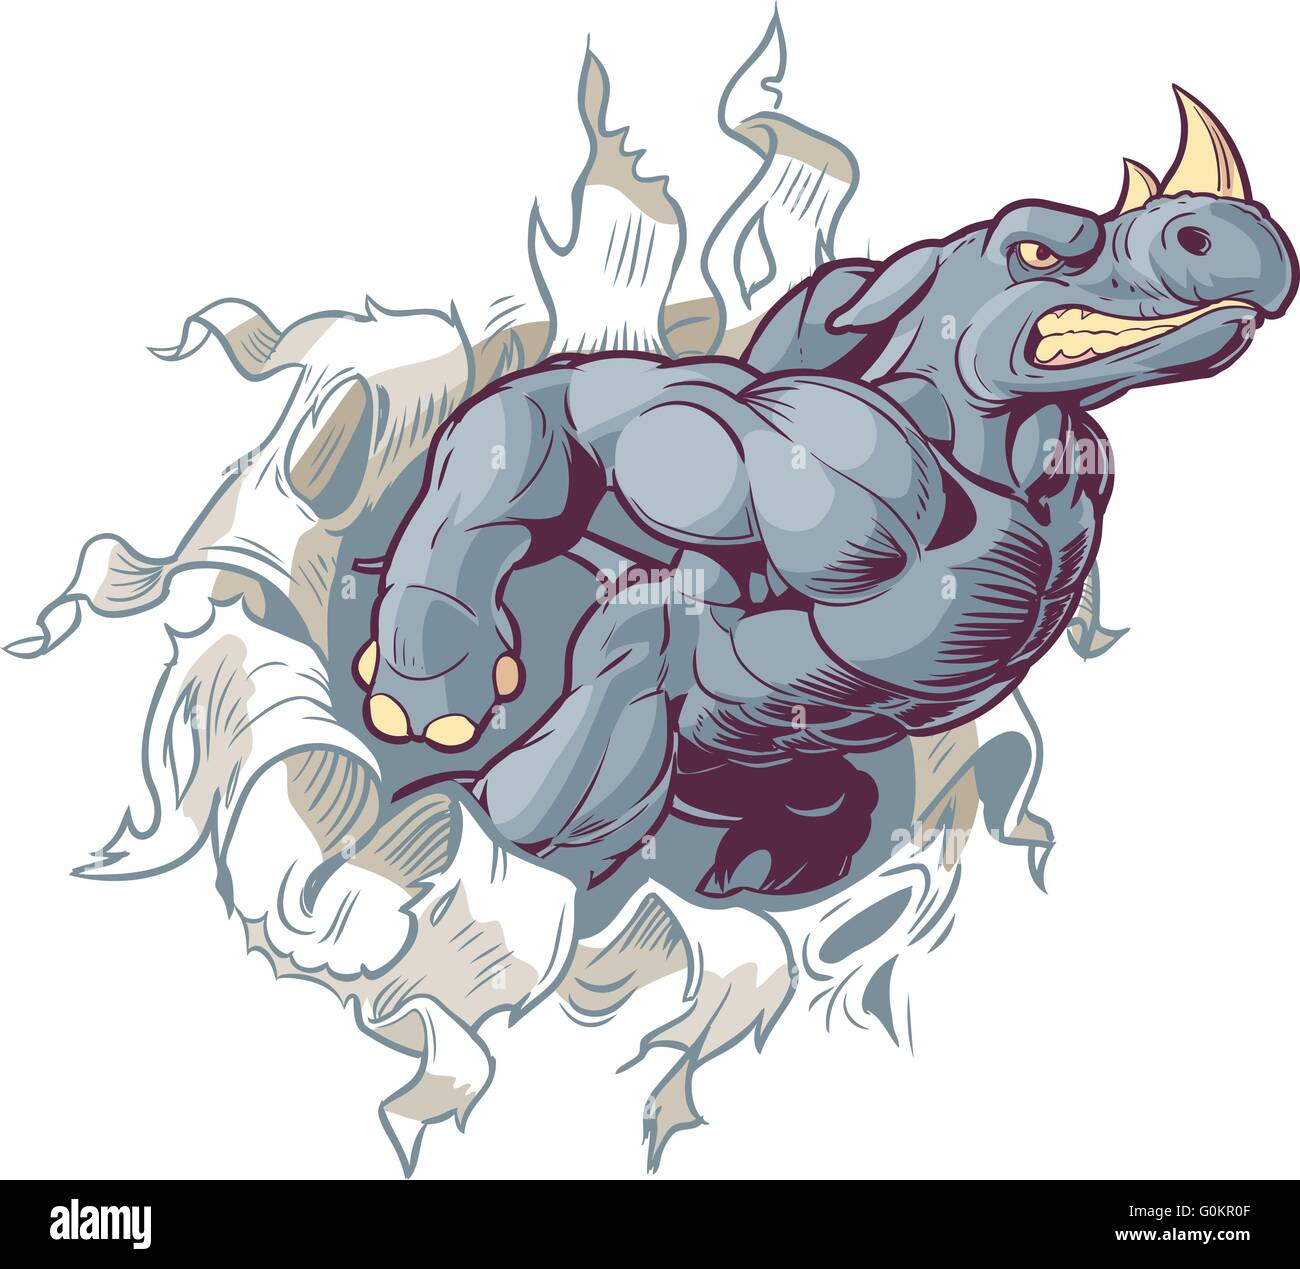 Vector Cartoon Clip Art Illustration of an Anthropomorphic Cartoon Mascot Rhino Ripping Through a Paper Background. - Stock Image